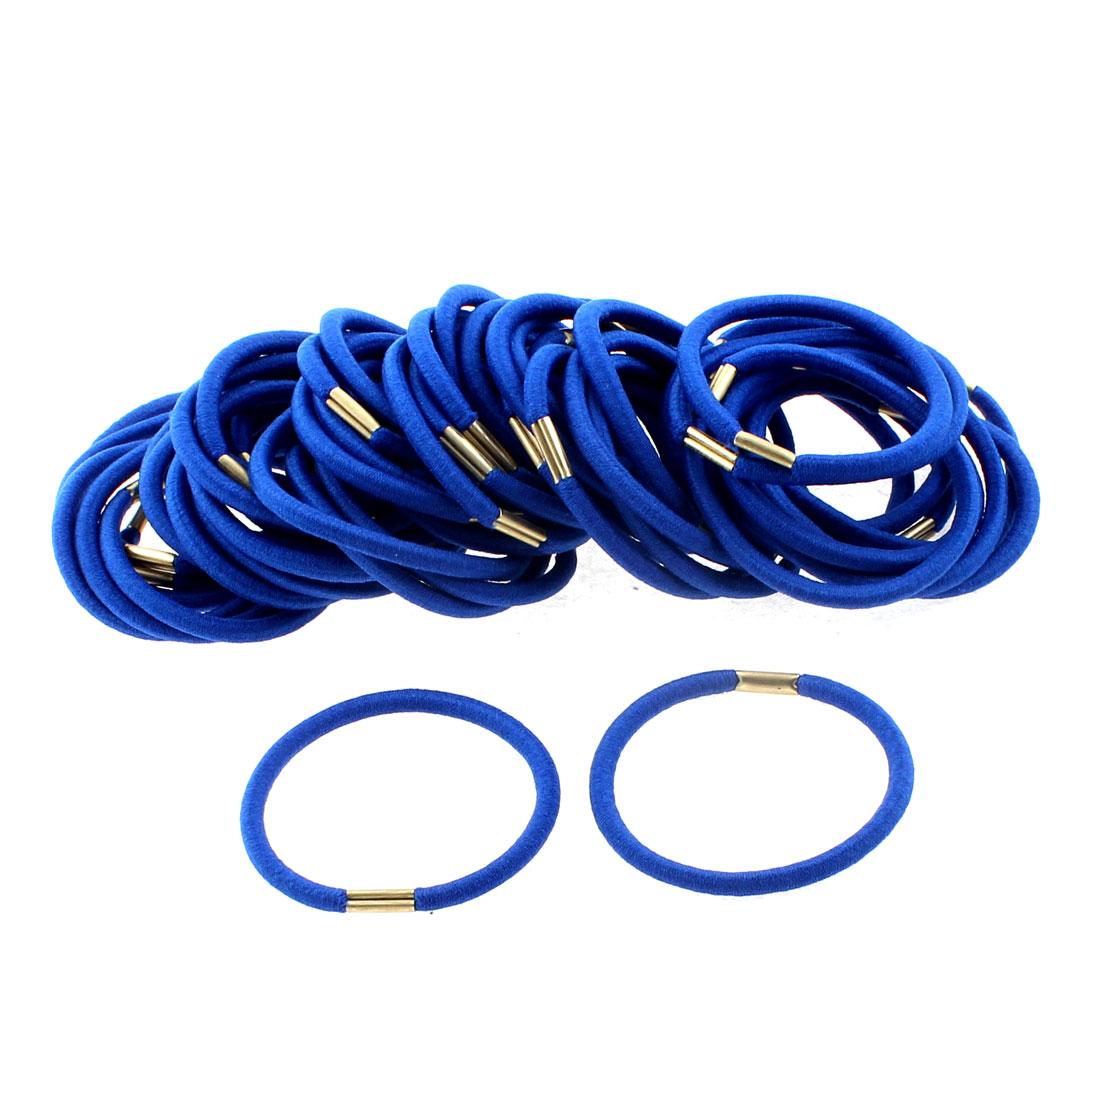 Women DIY Craft Elastic Hair Tie Rope Band Hairband Ponytail Holder Dark Blue 50pcs